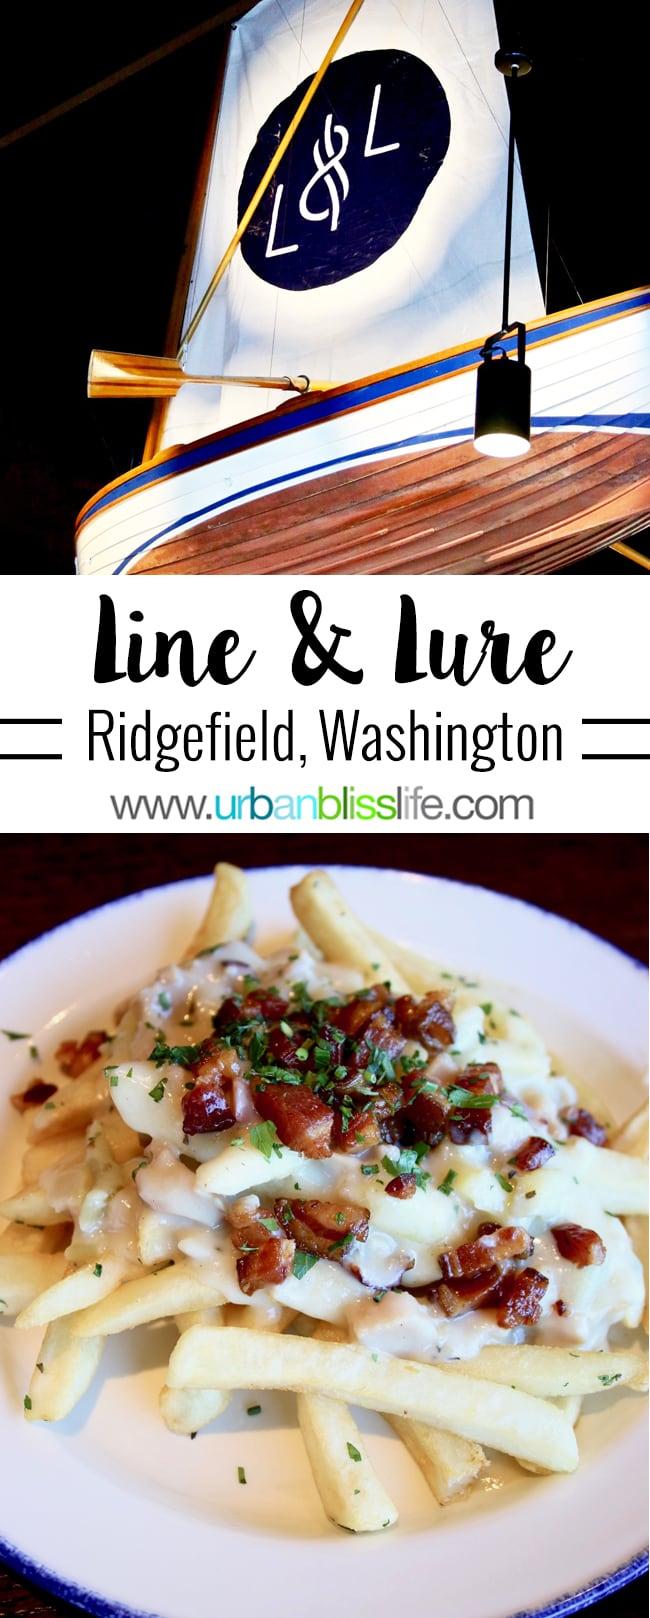 Line and Lure restaurant Ridgefield Washington, restaurant review on UrbanBlissLife.com